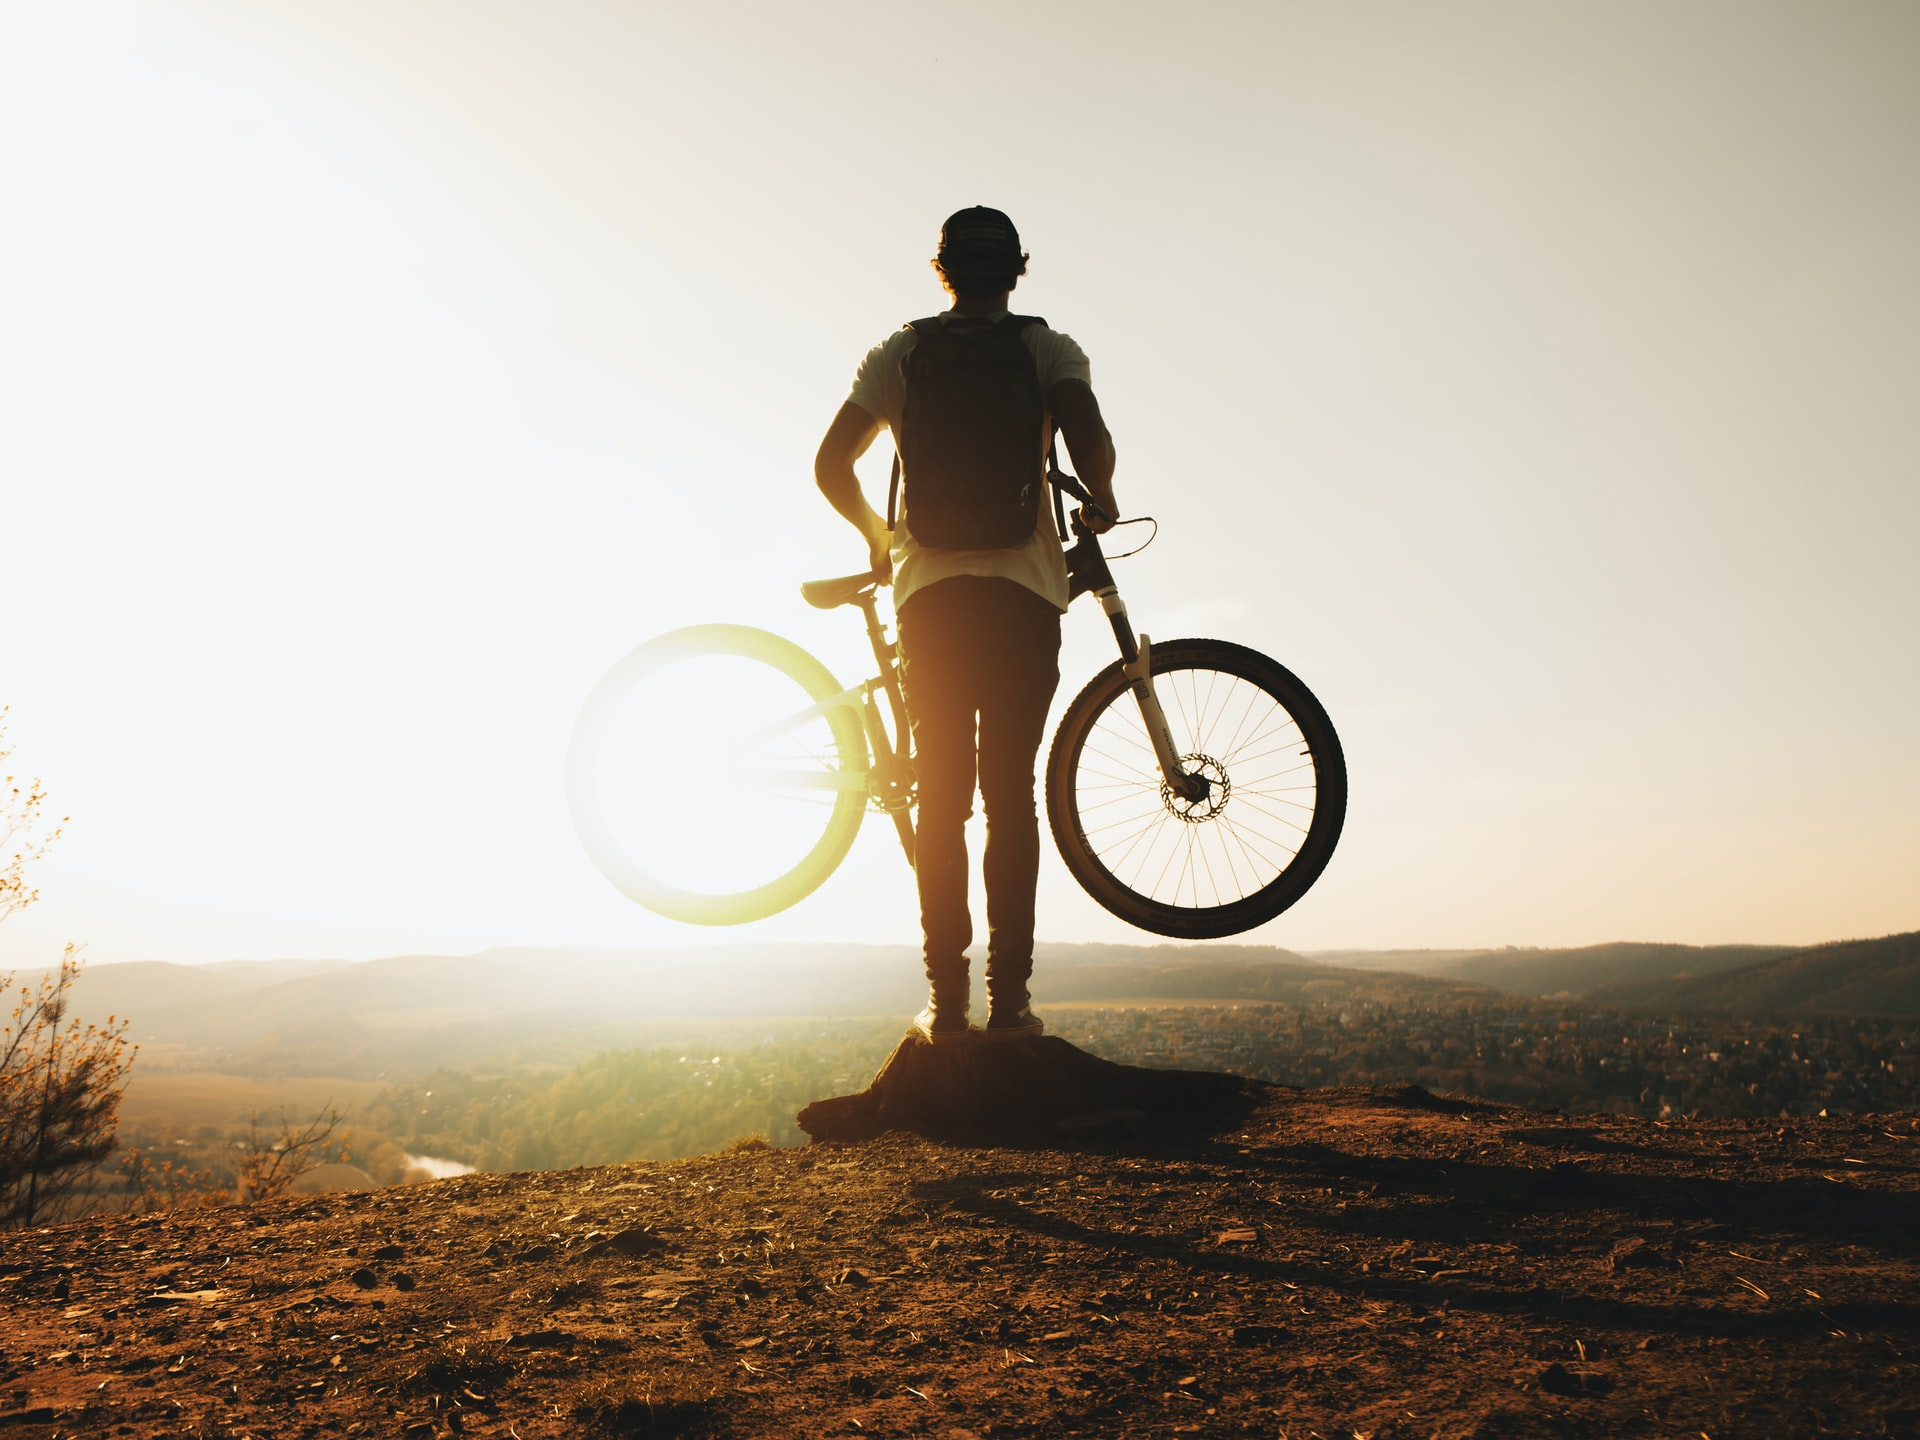 daniel frank UwvGAmVeQ1I unsplash - Cannondale mountainbike til cykelentusiasten